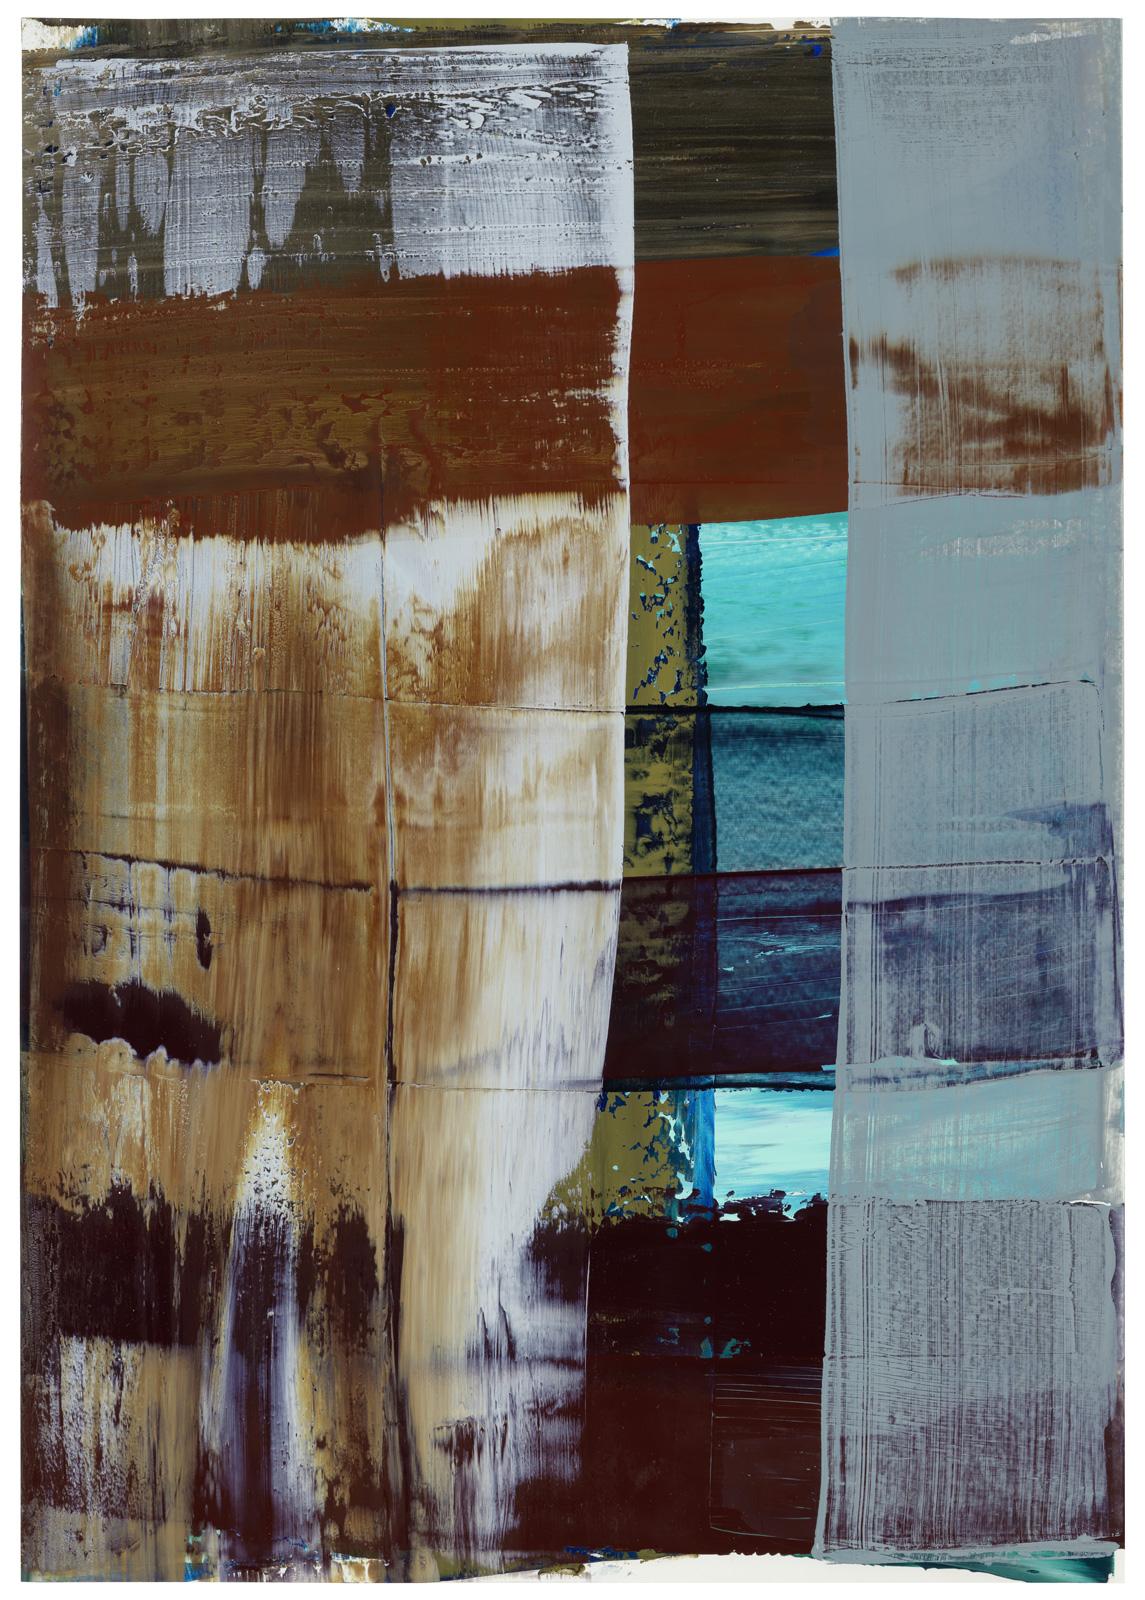 ohne Titel, Öl auf Papier, 51x36cm, 2018